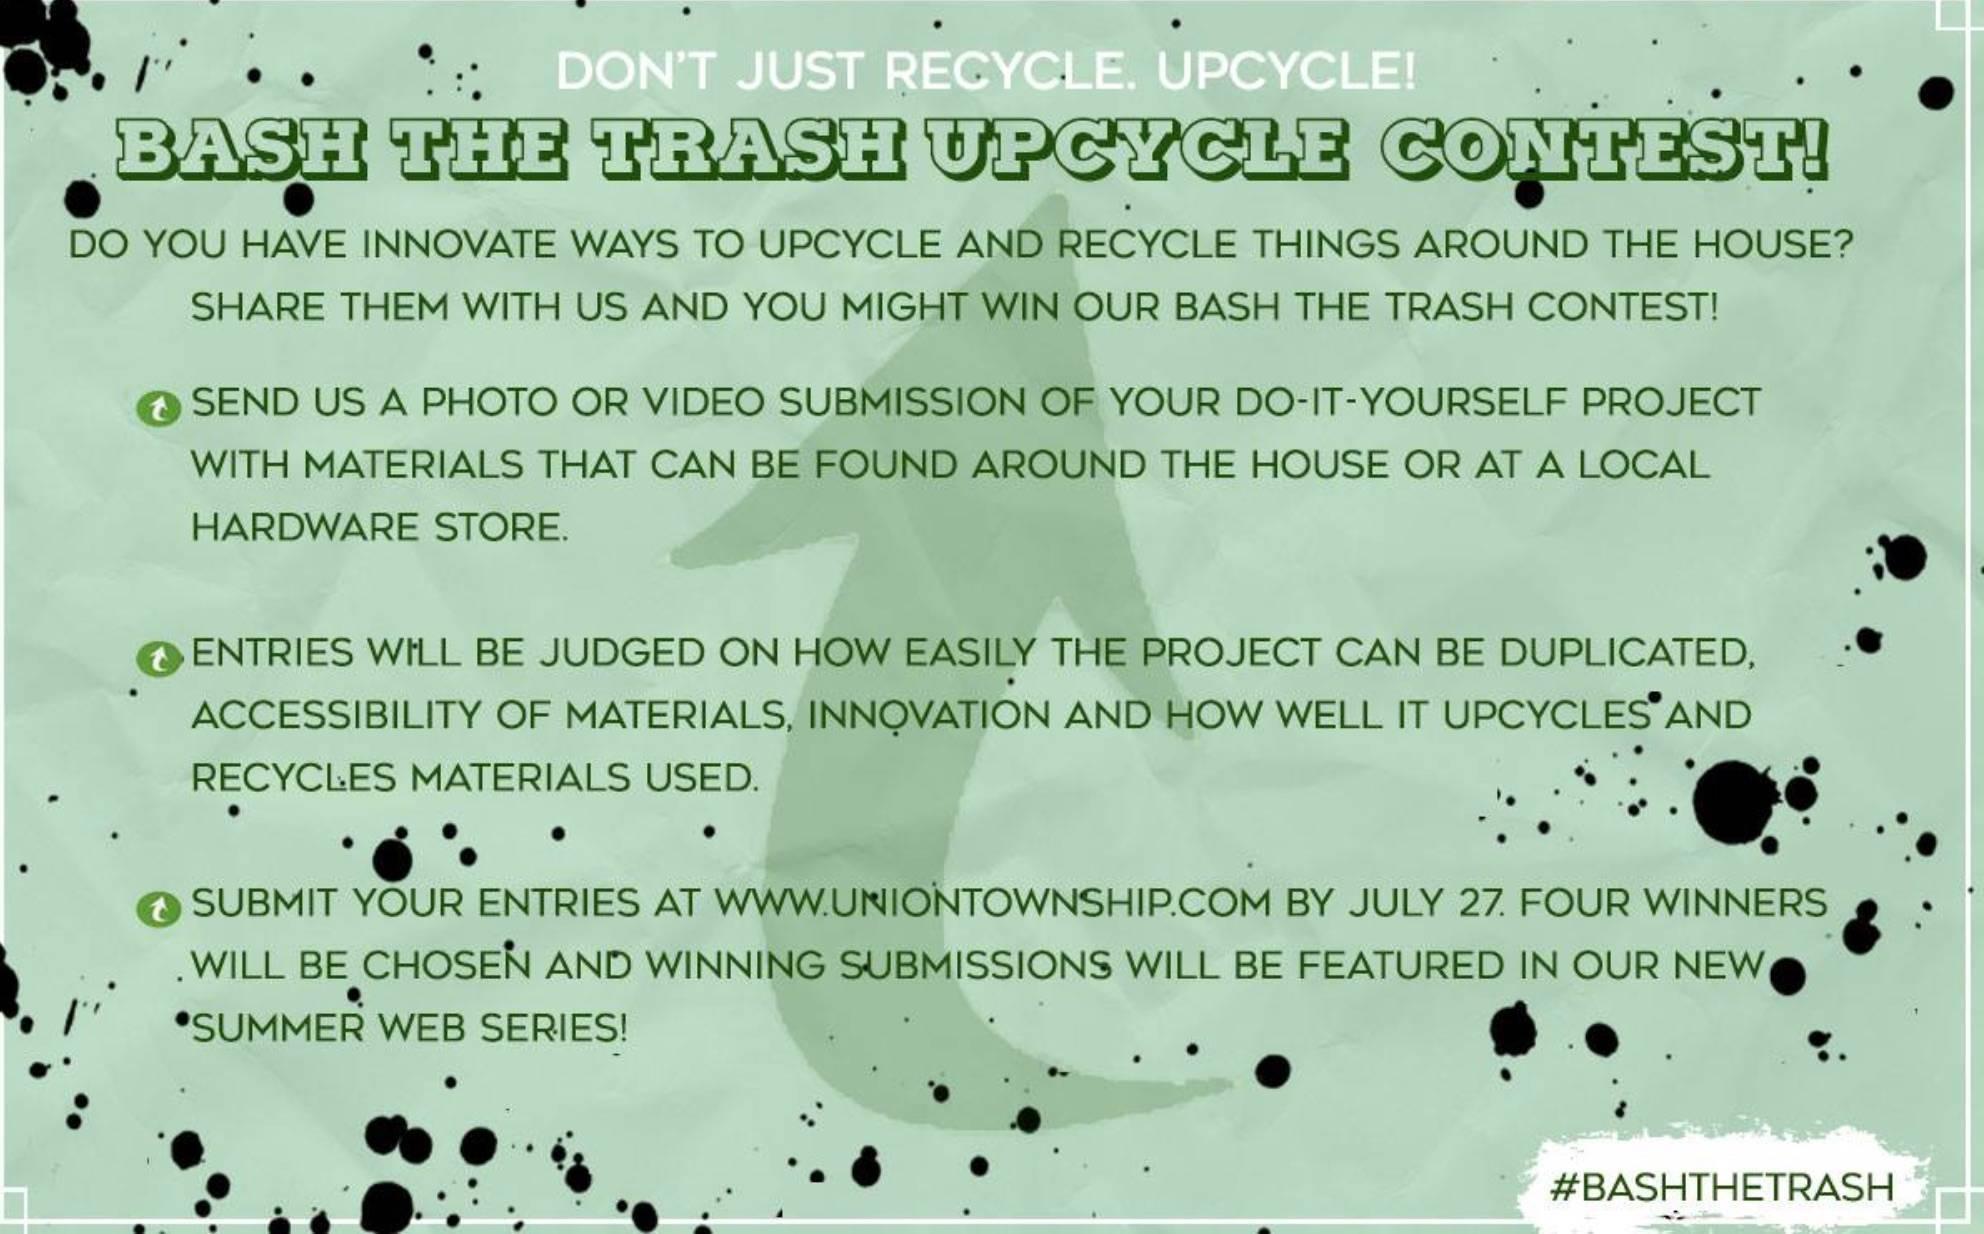 2aa09a13b79feb222655_9aa2270675e08dbc3c09_bash_the_trash2.jpg